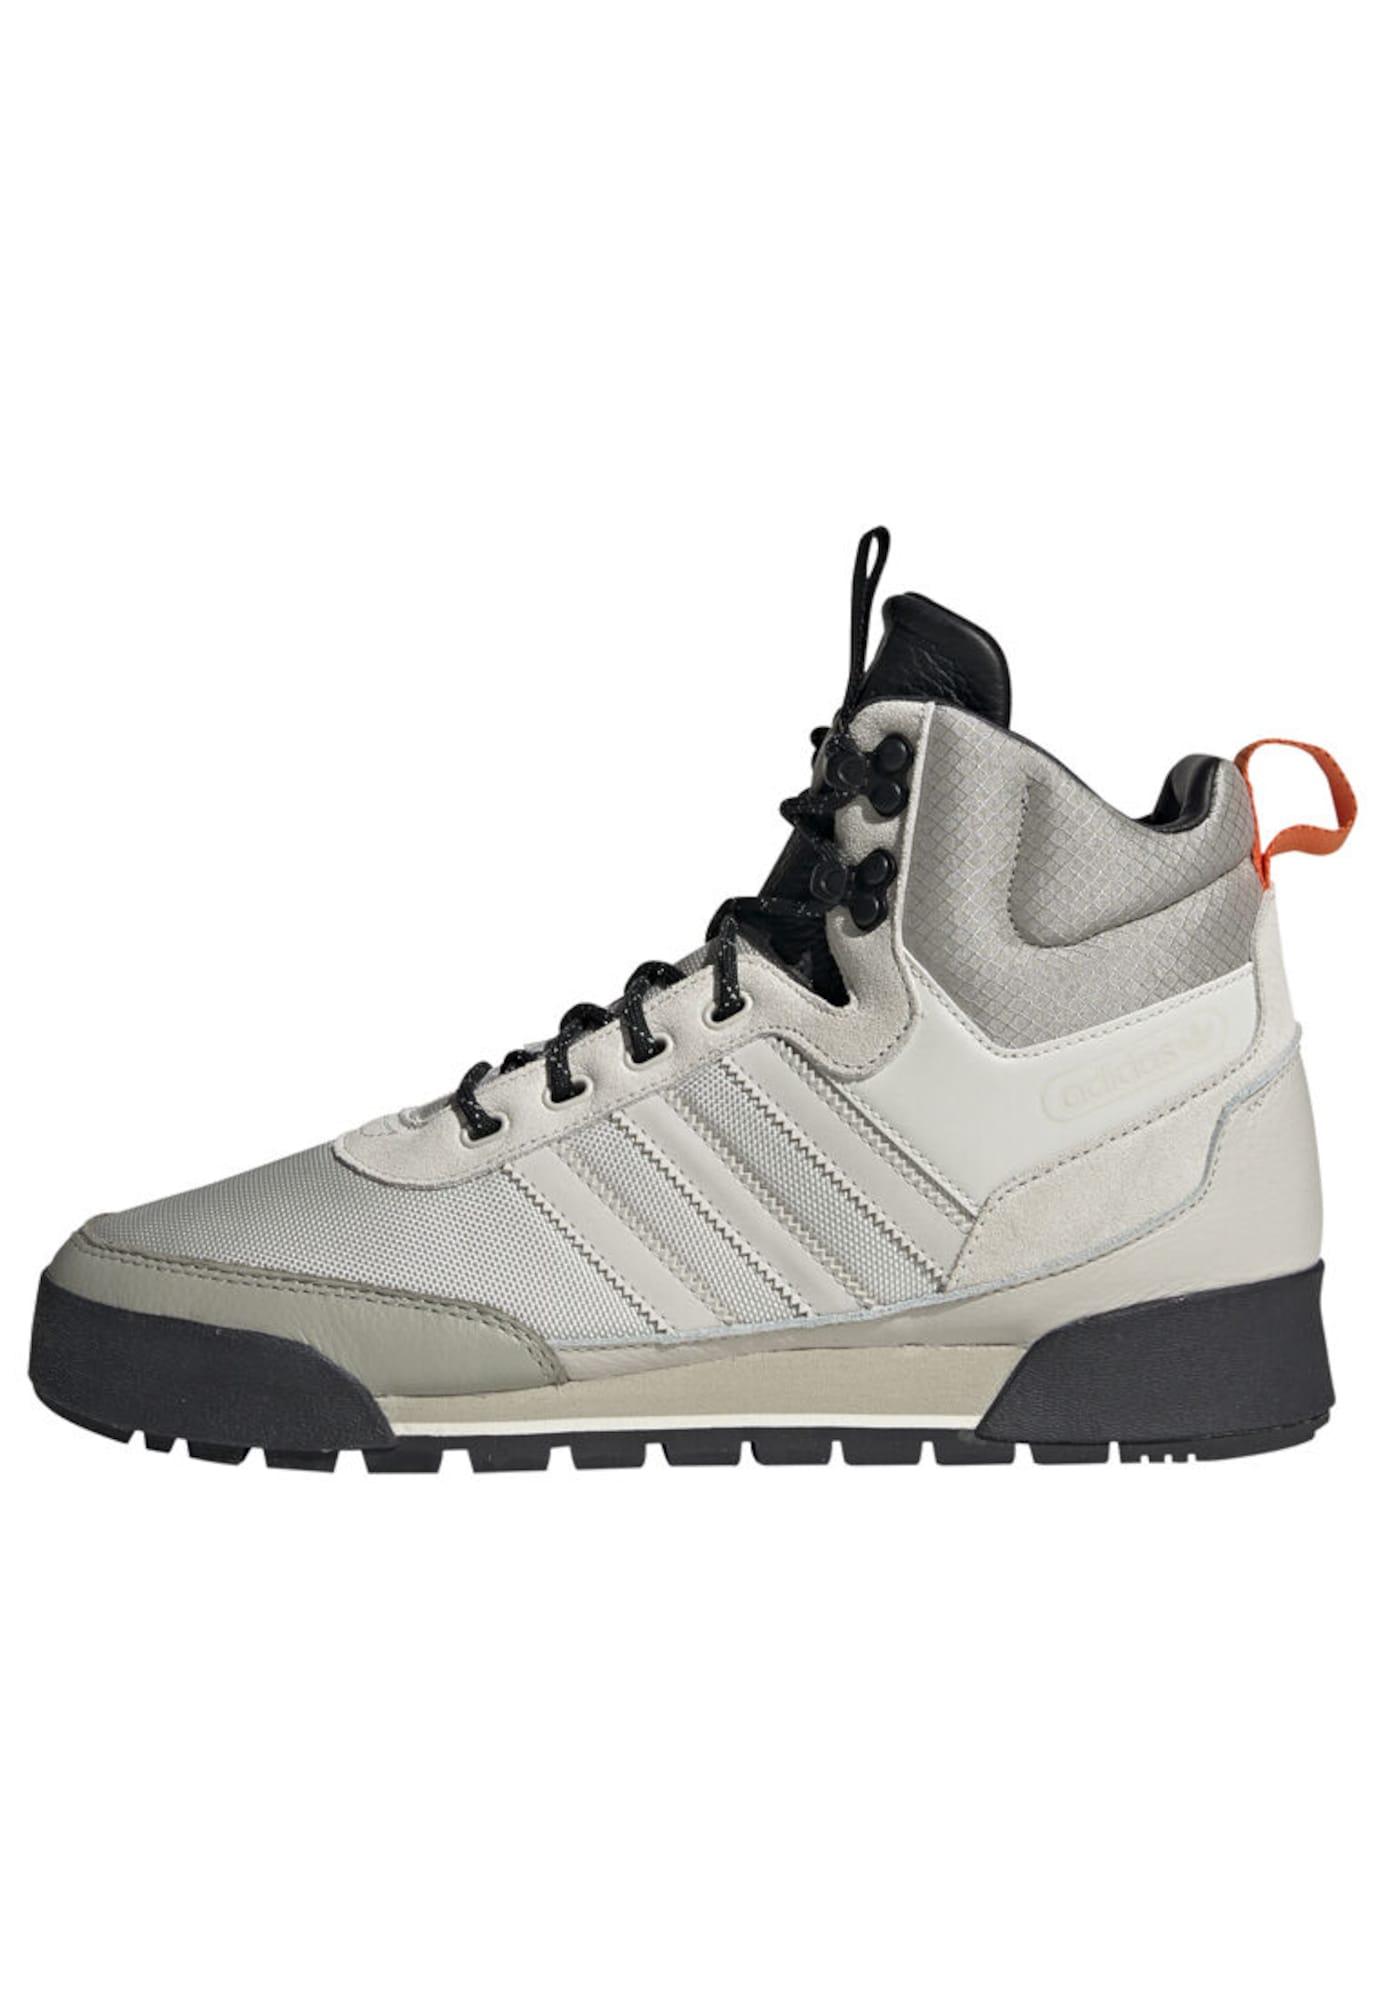 ADIDAS ORIGINALS Auliniai batai su raišteliais 'BAARA BOOTS' pilka